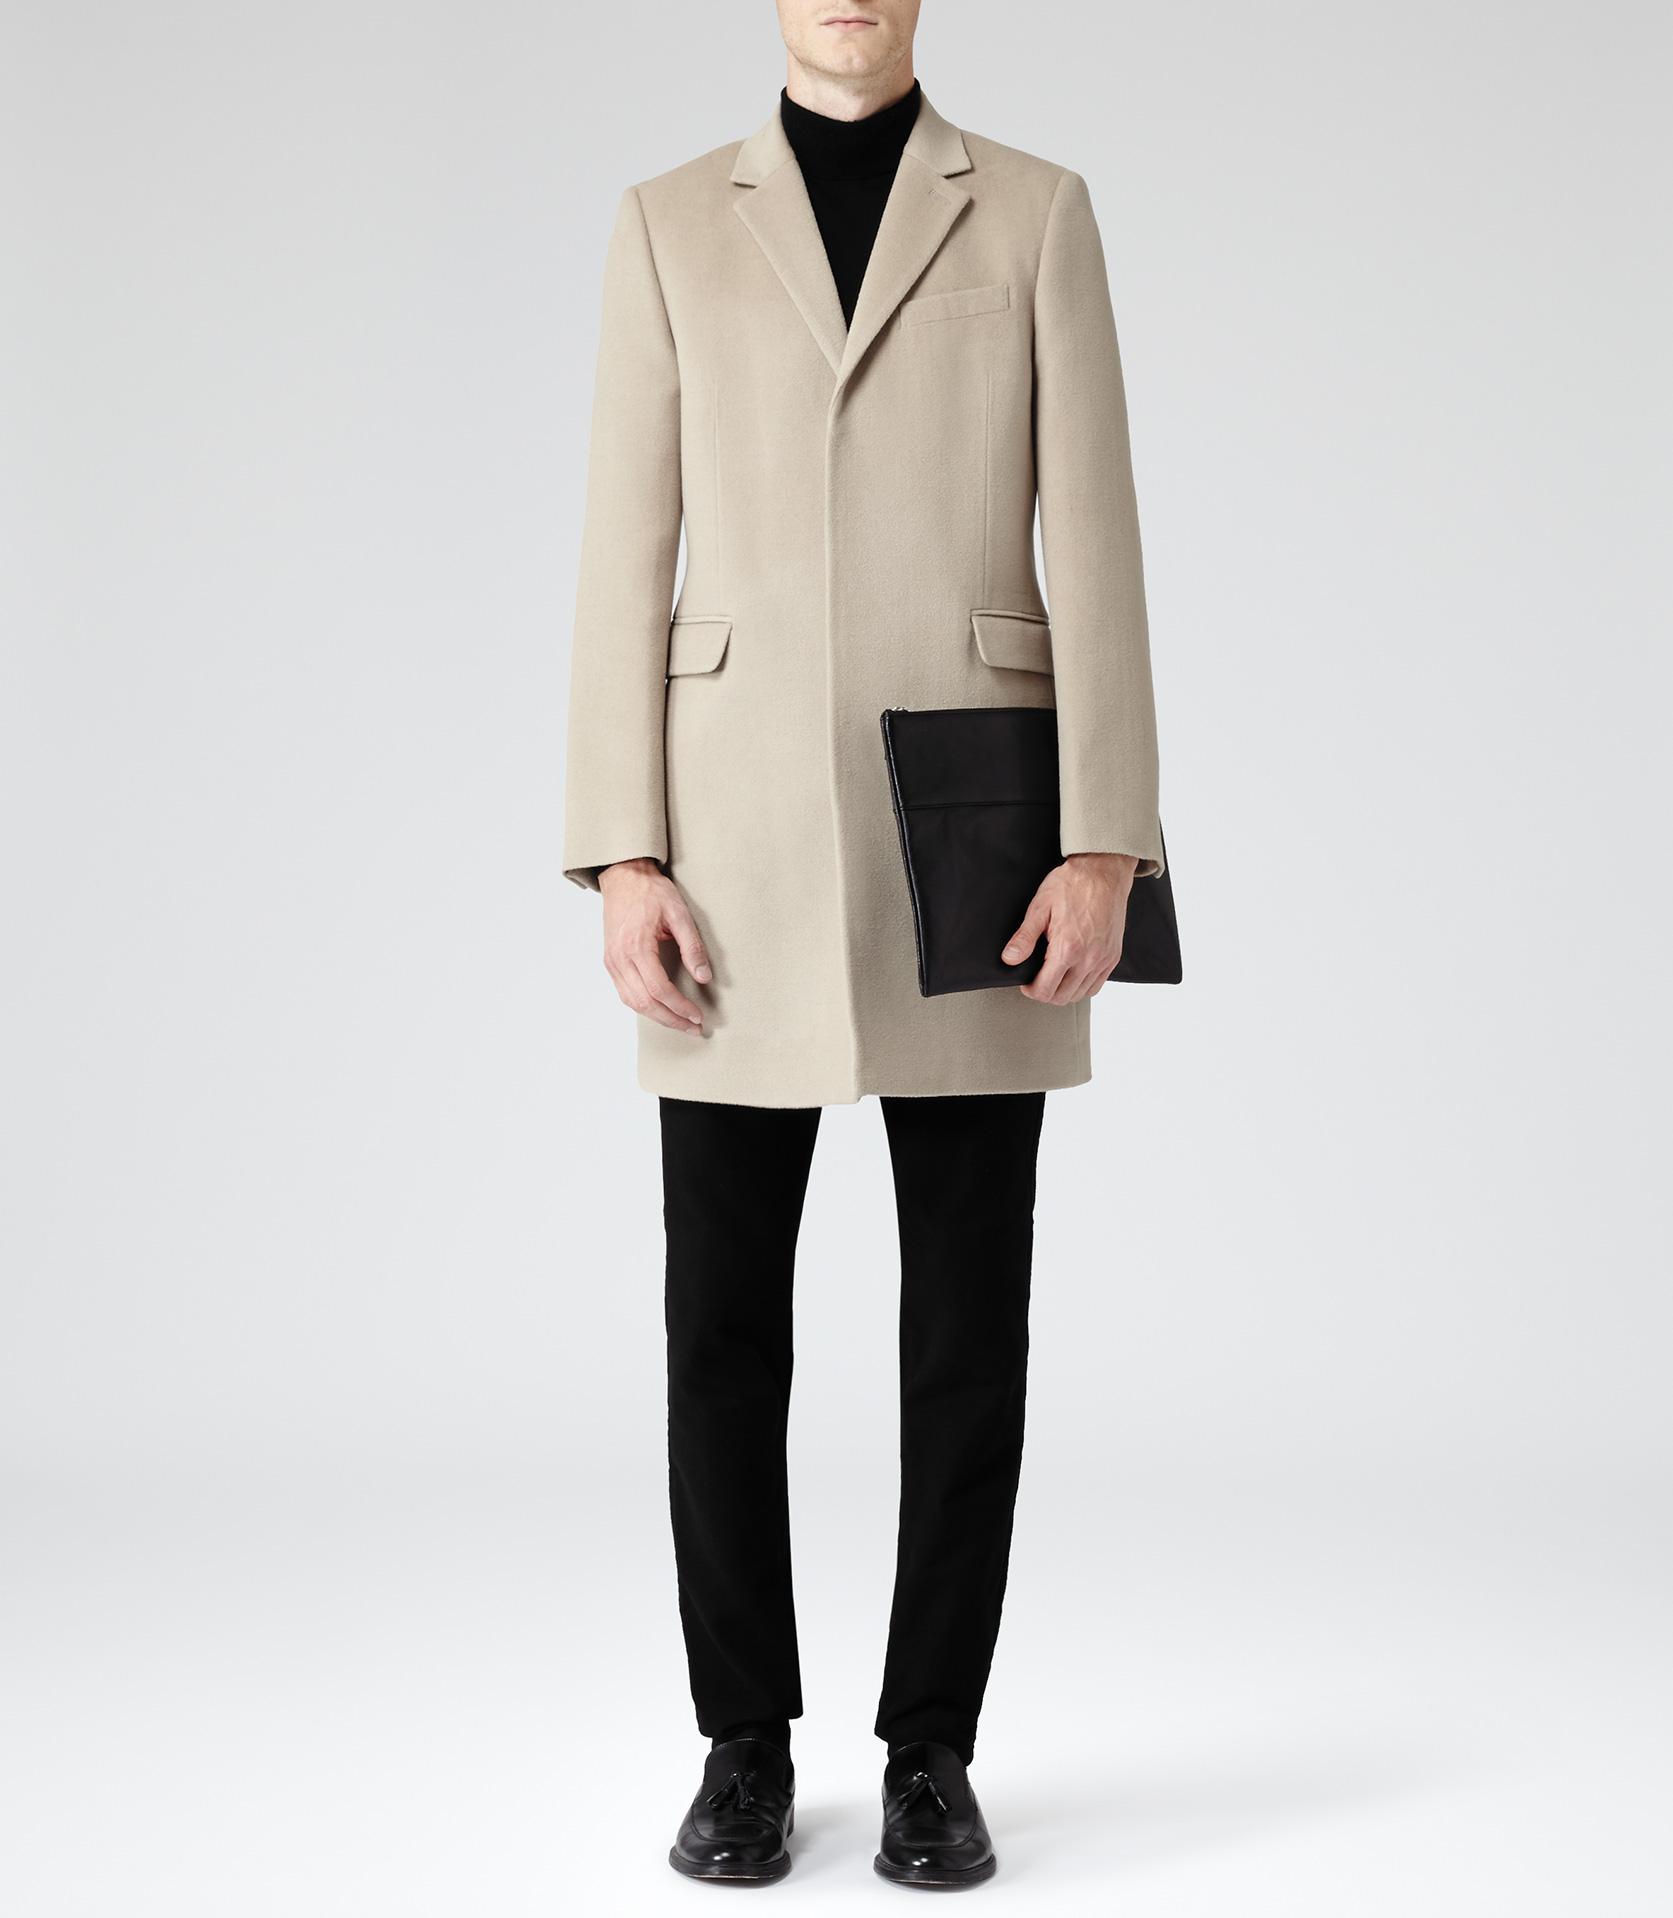 Vassal camel single breasted wool coat